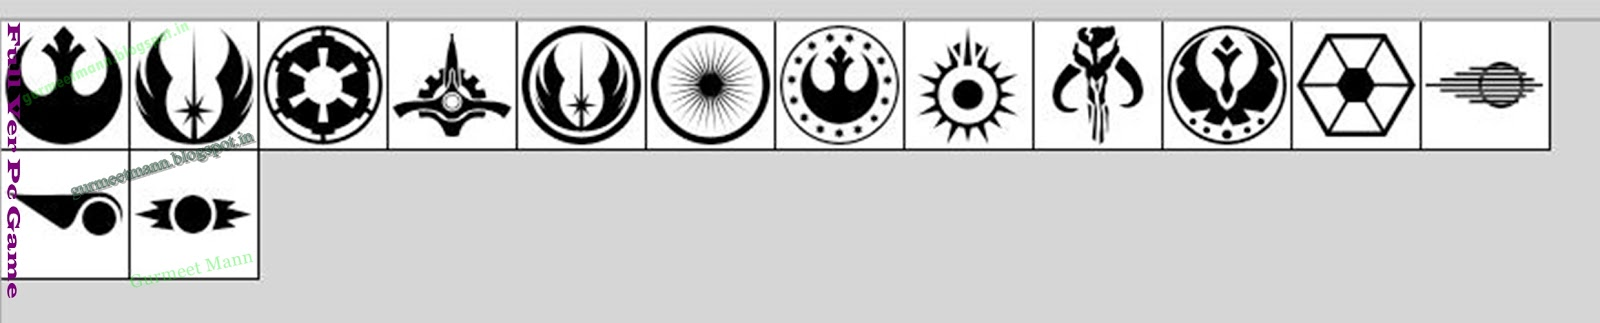 Copy Paste Star Wars